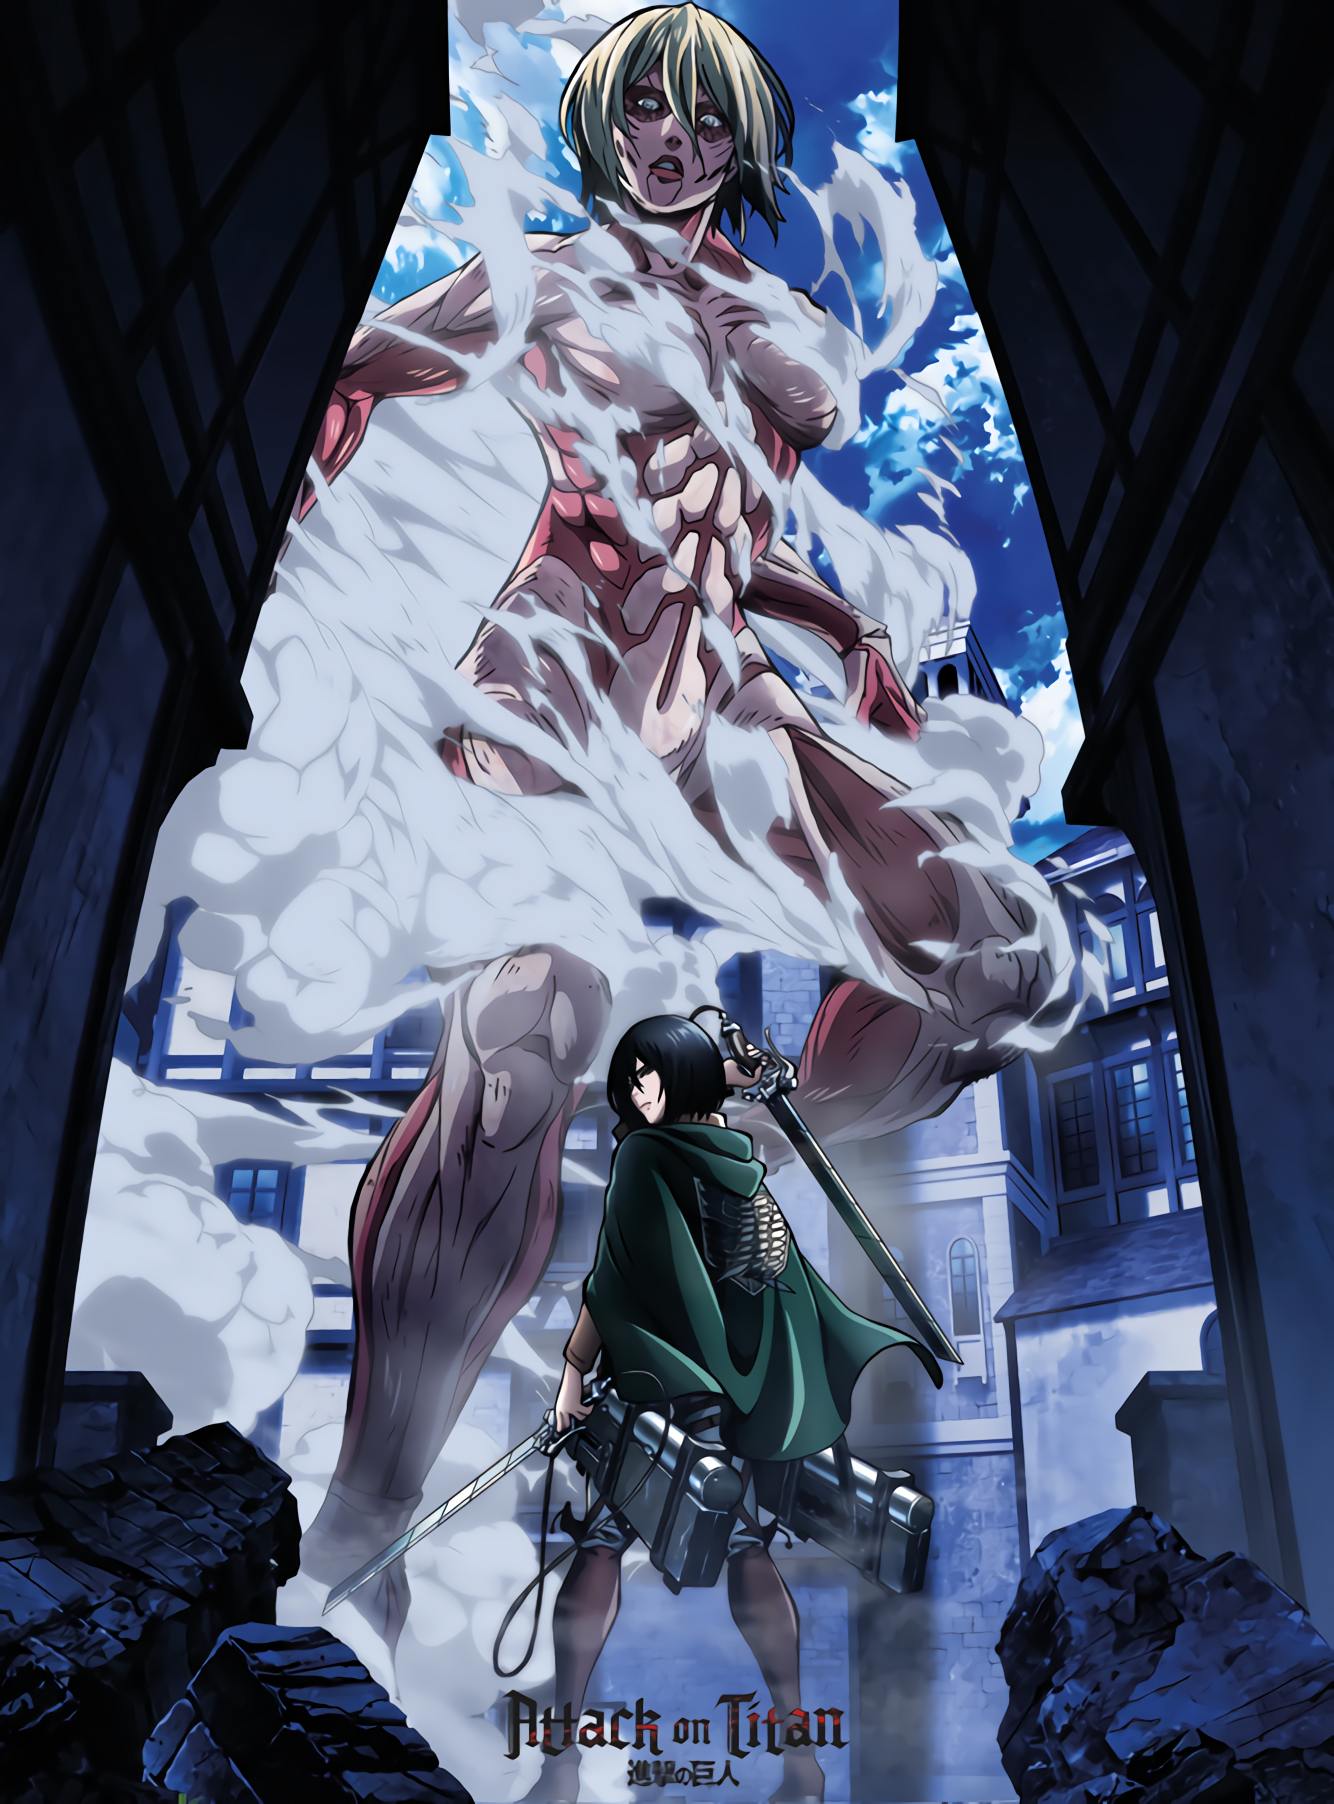 Mikasa And Female Titan Attack On Titan Aot Snk Animegirl Anime Manga Plusultra Hunter X Hunter Cara Menggambar Seni Anime